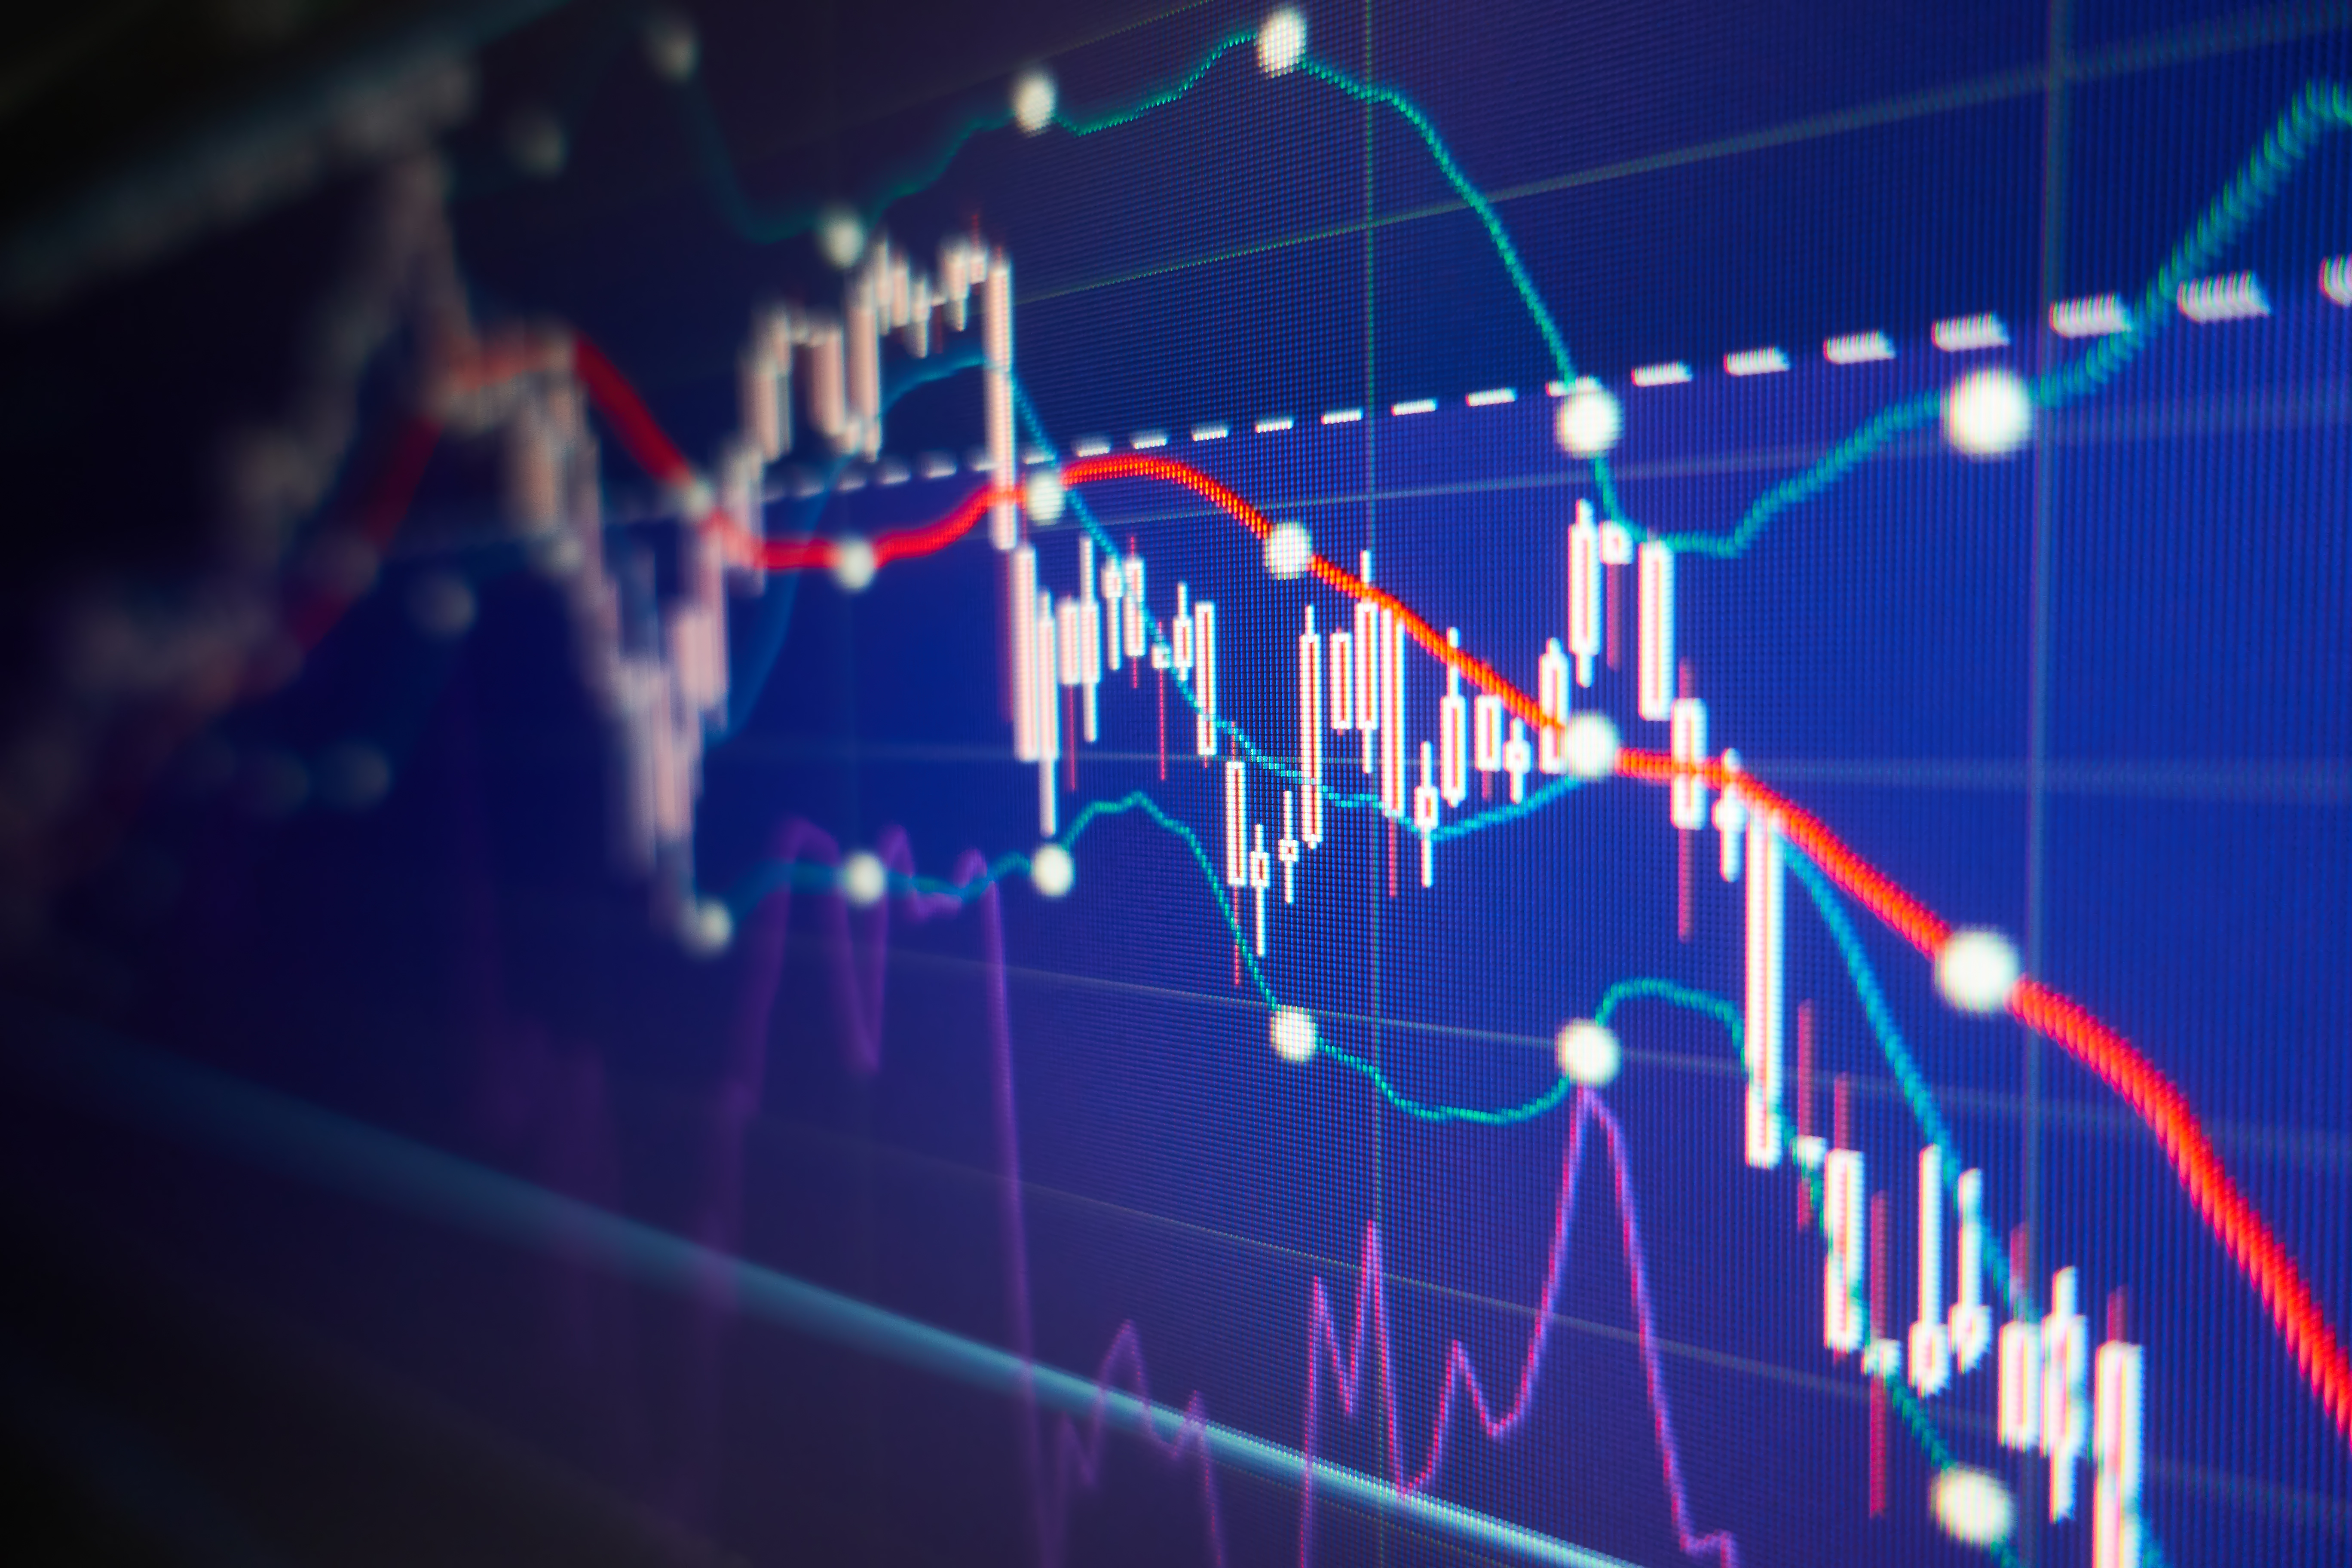 Trender inom kredithantering i Europa